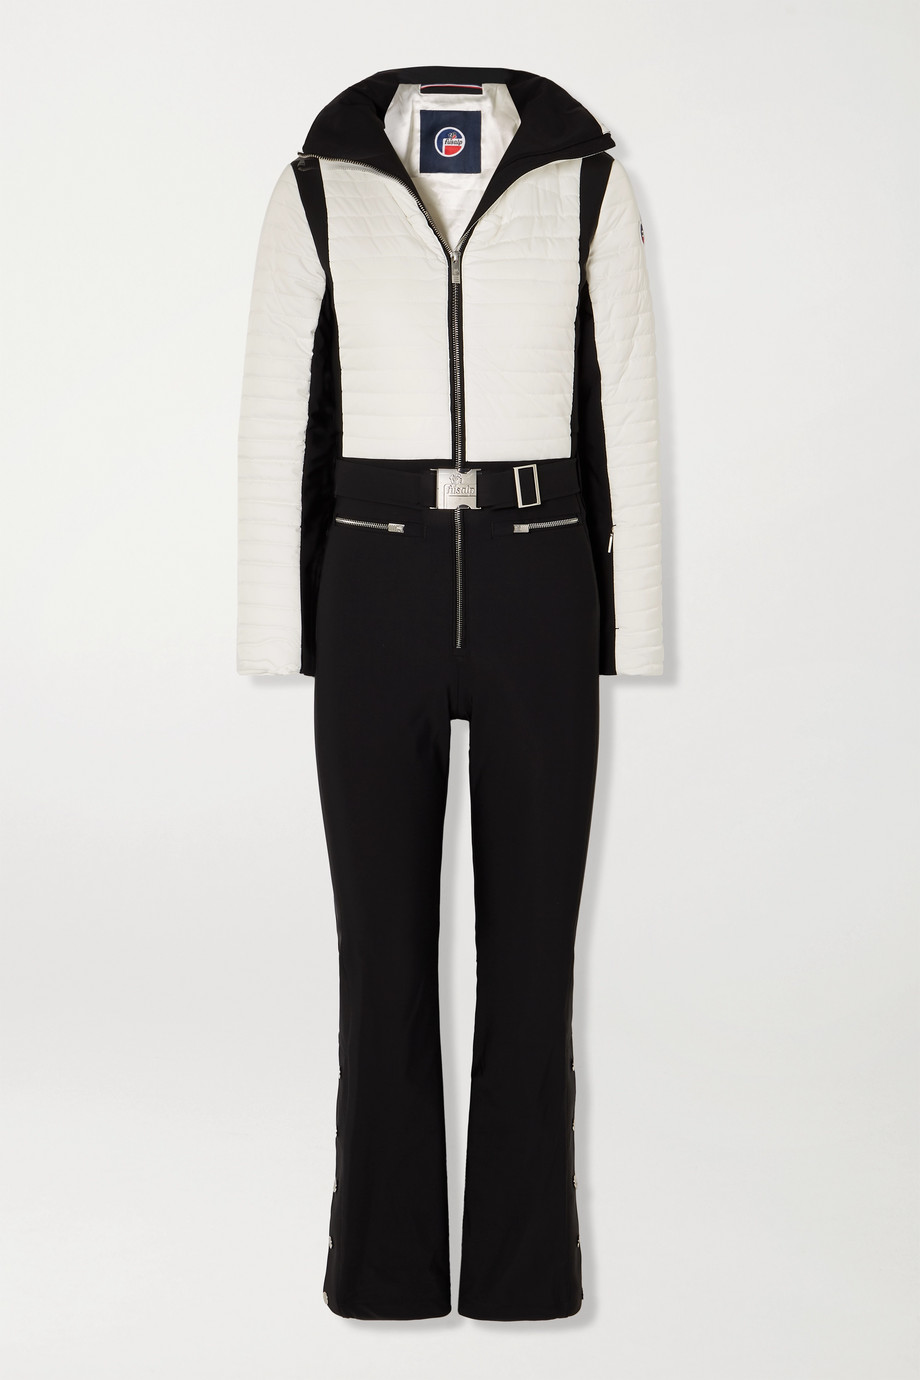 Fusalp Crouze 双色绗缝连体滑雪服